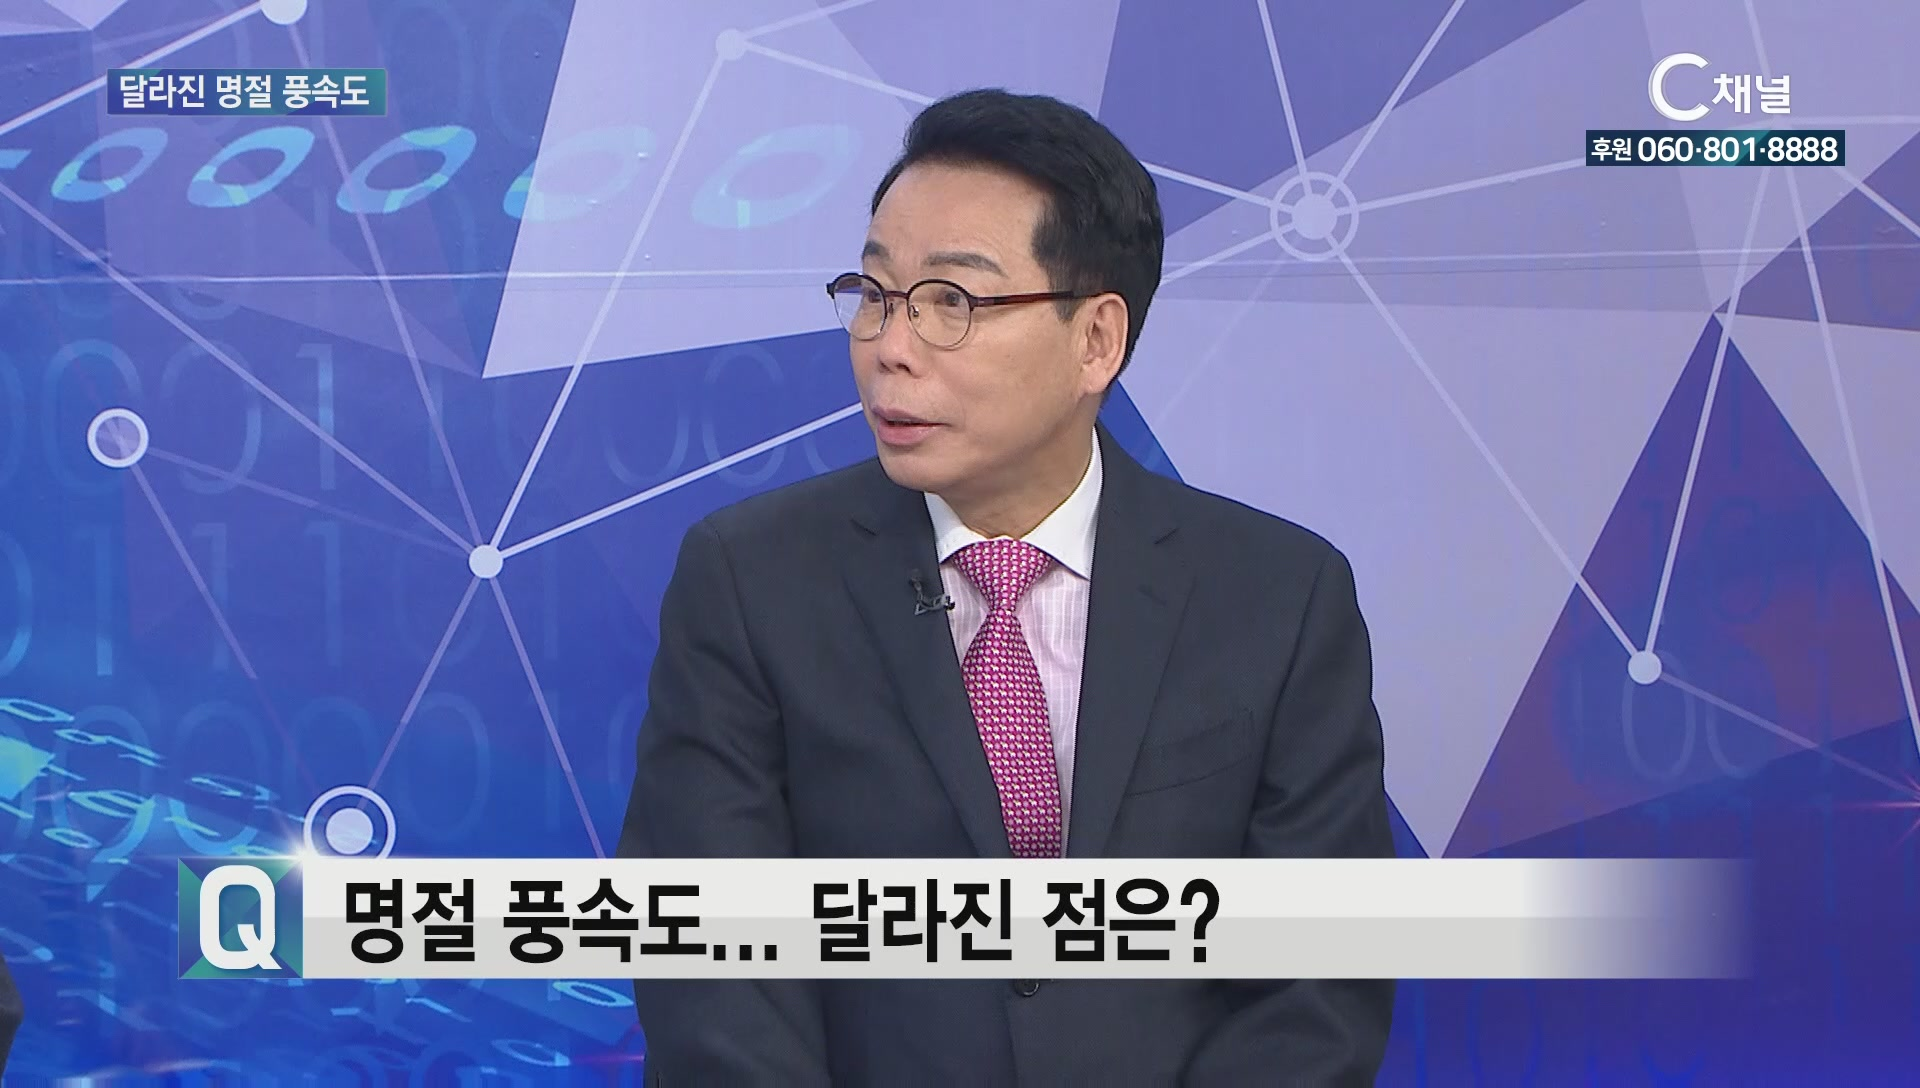 C채널 REPORT PLUS  2020년 01월 24일 C채널 뉴스